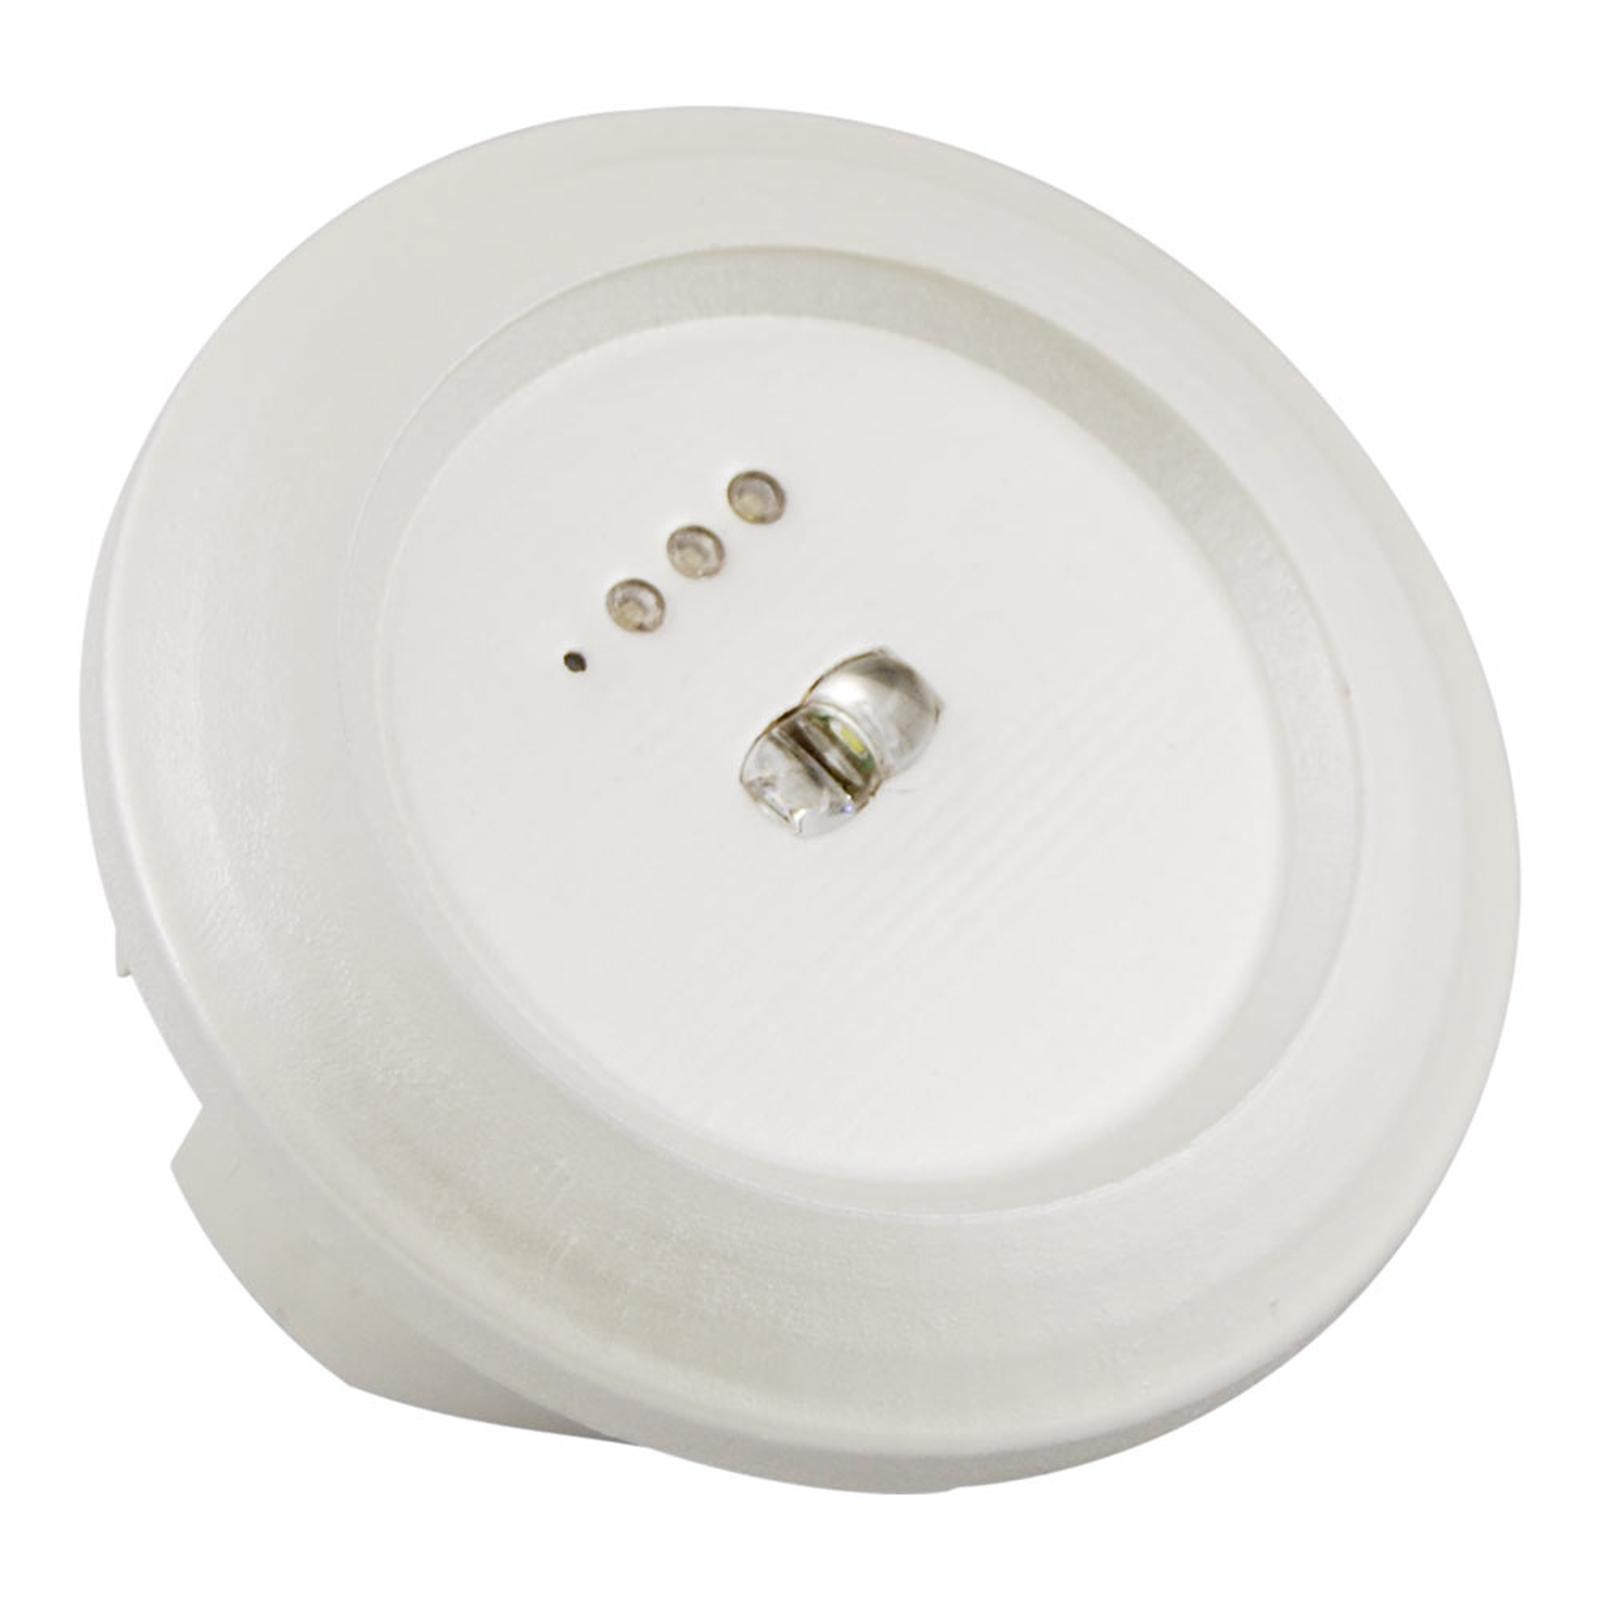 Round LED emergency light Spot Light escape route_3002234_1